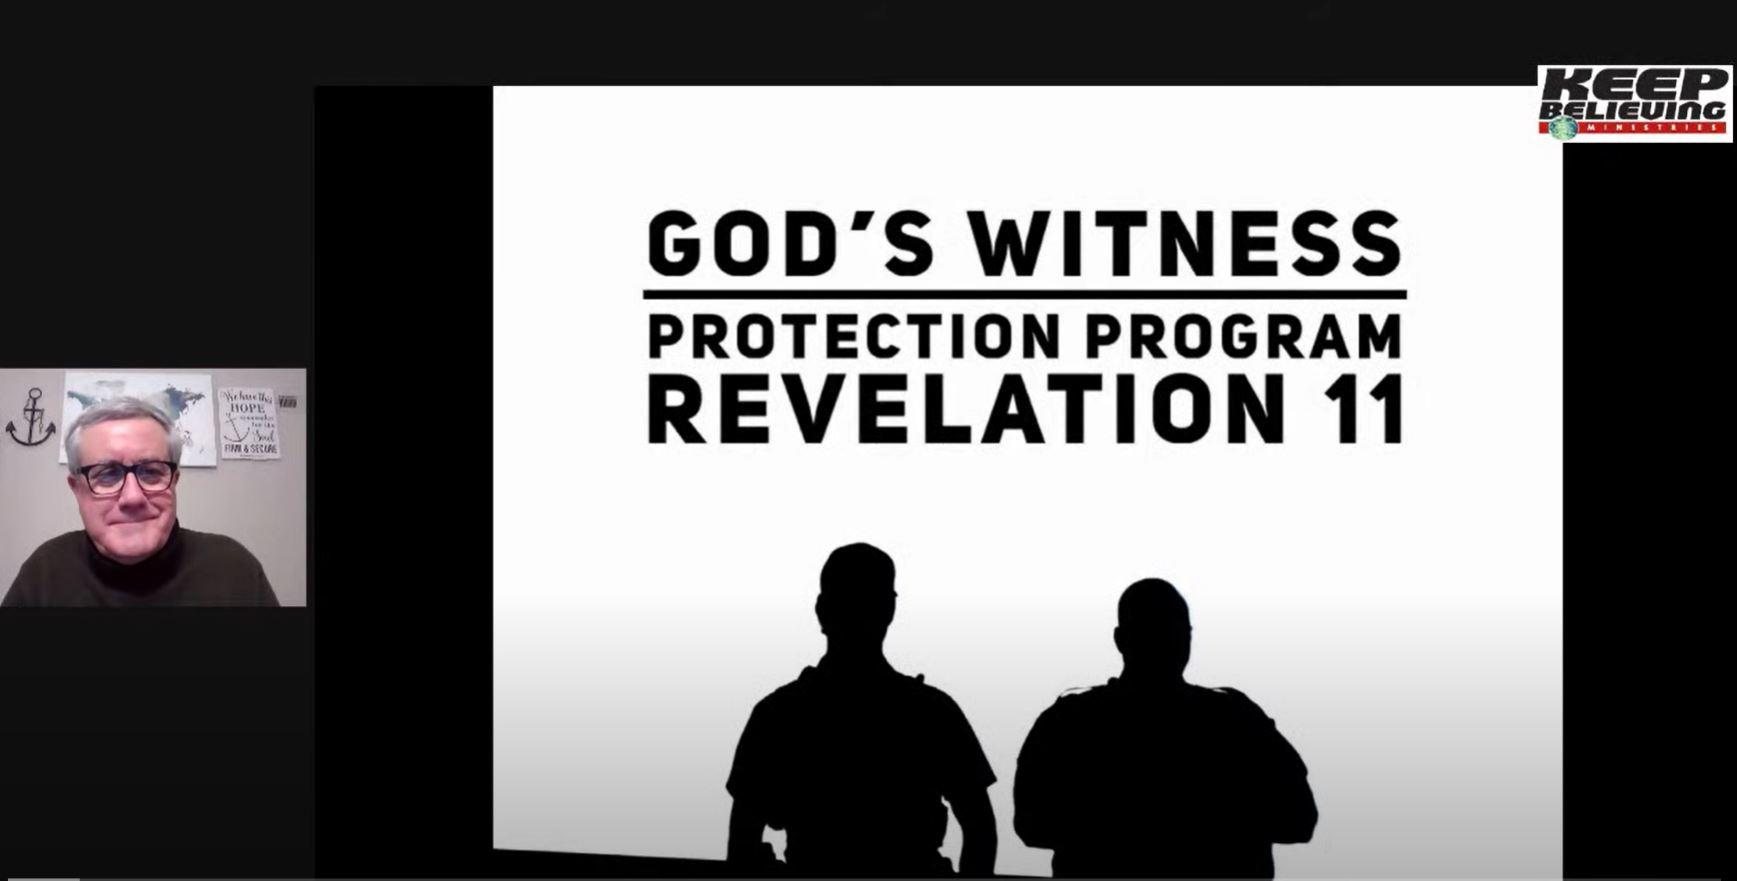 God's Witness Protection Program